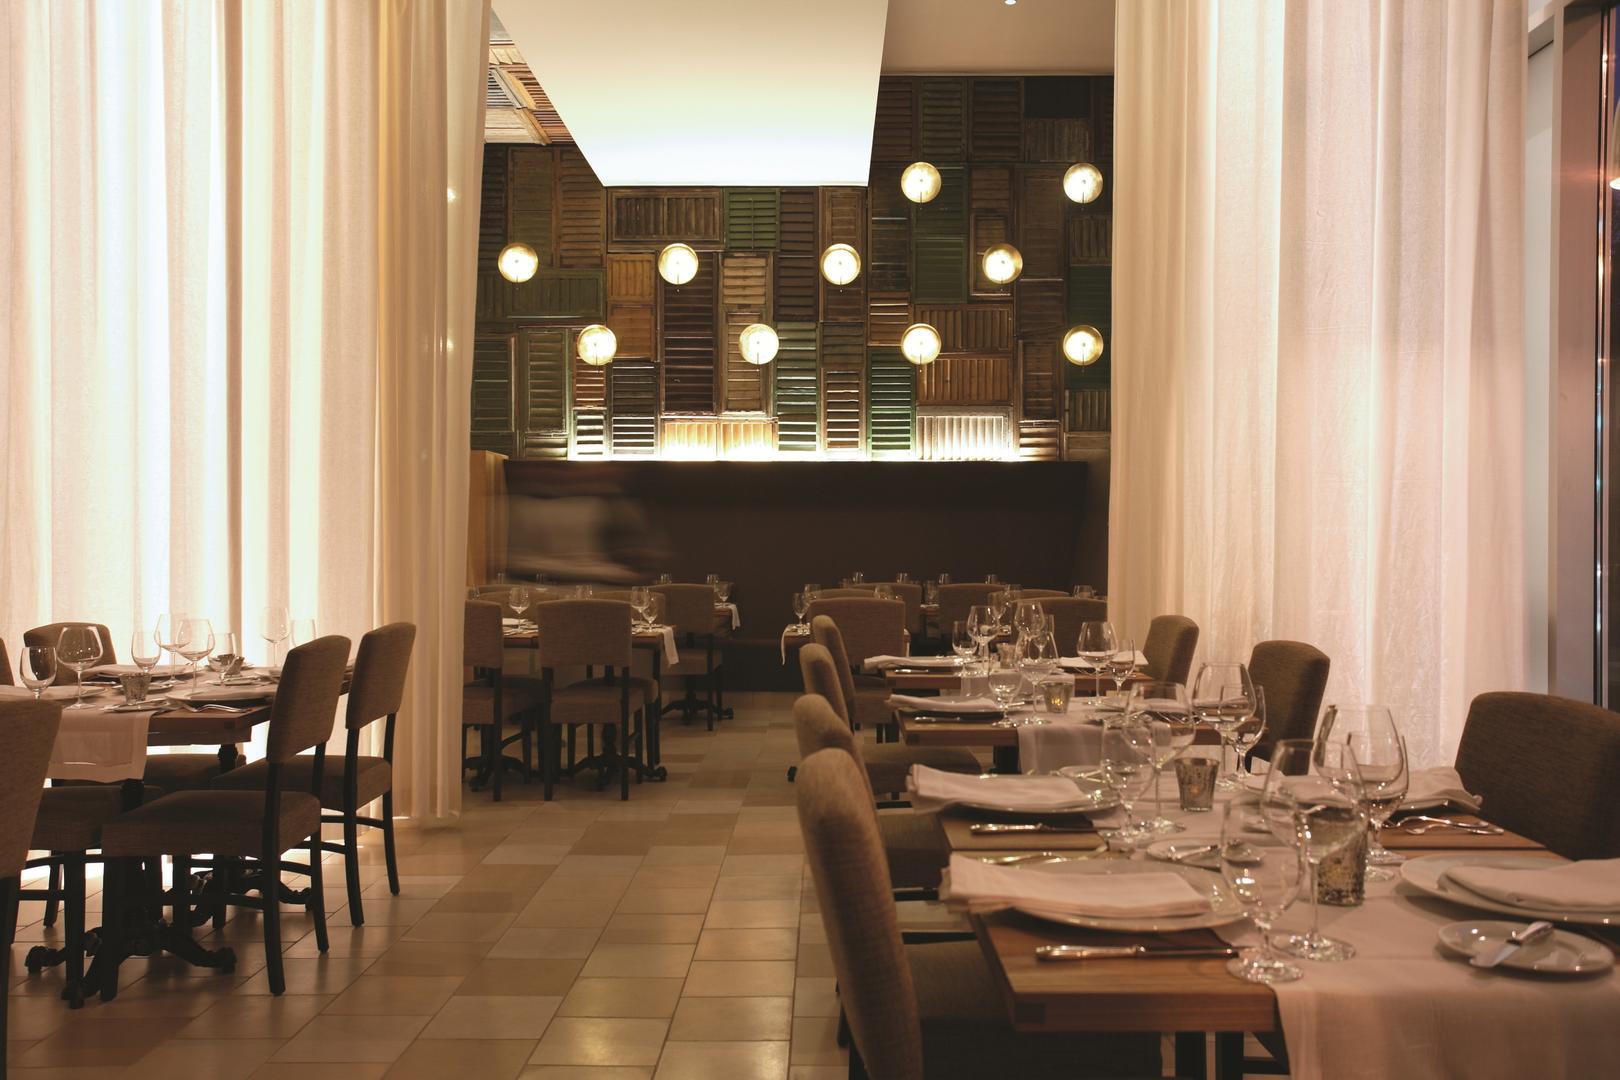 Ella Dining Room U0026 Bar   Corporate Events, Wedding Locations ...